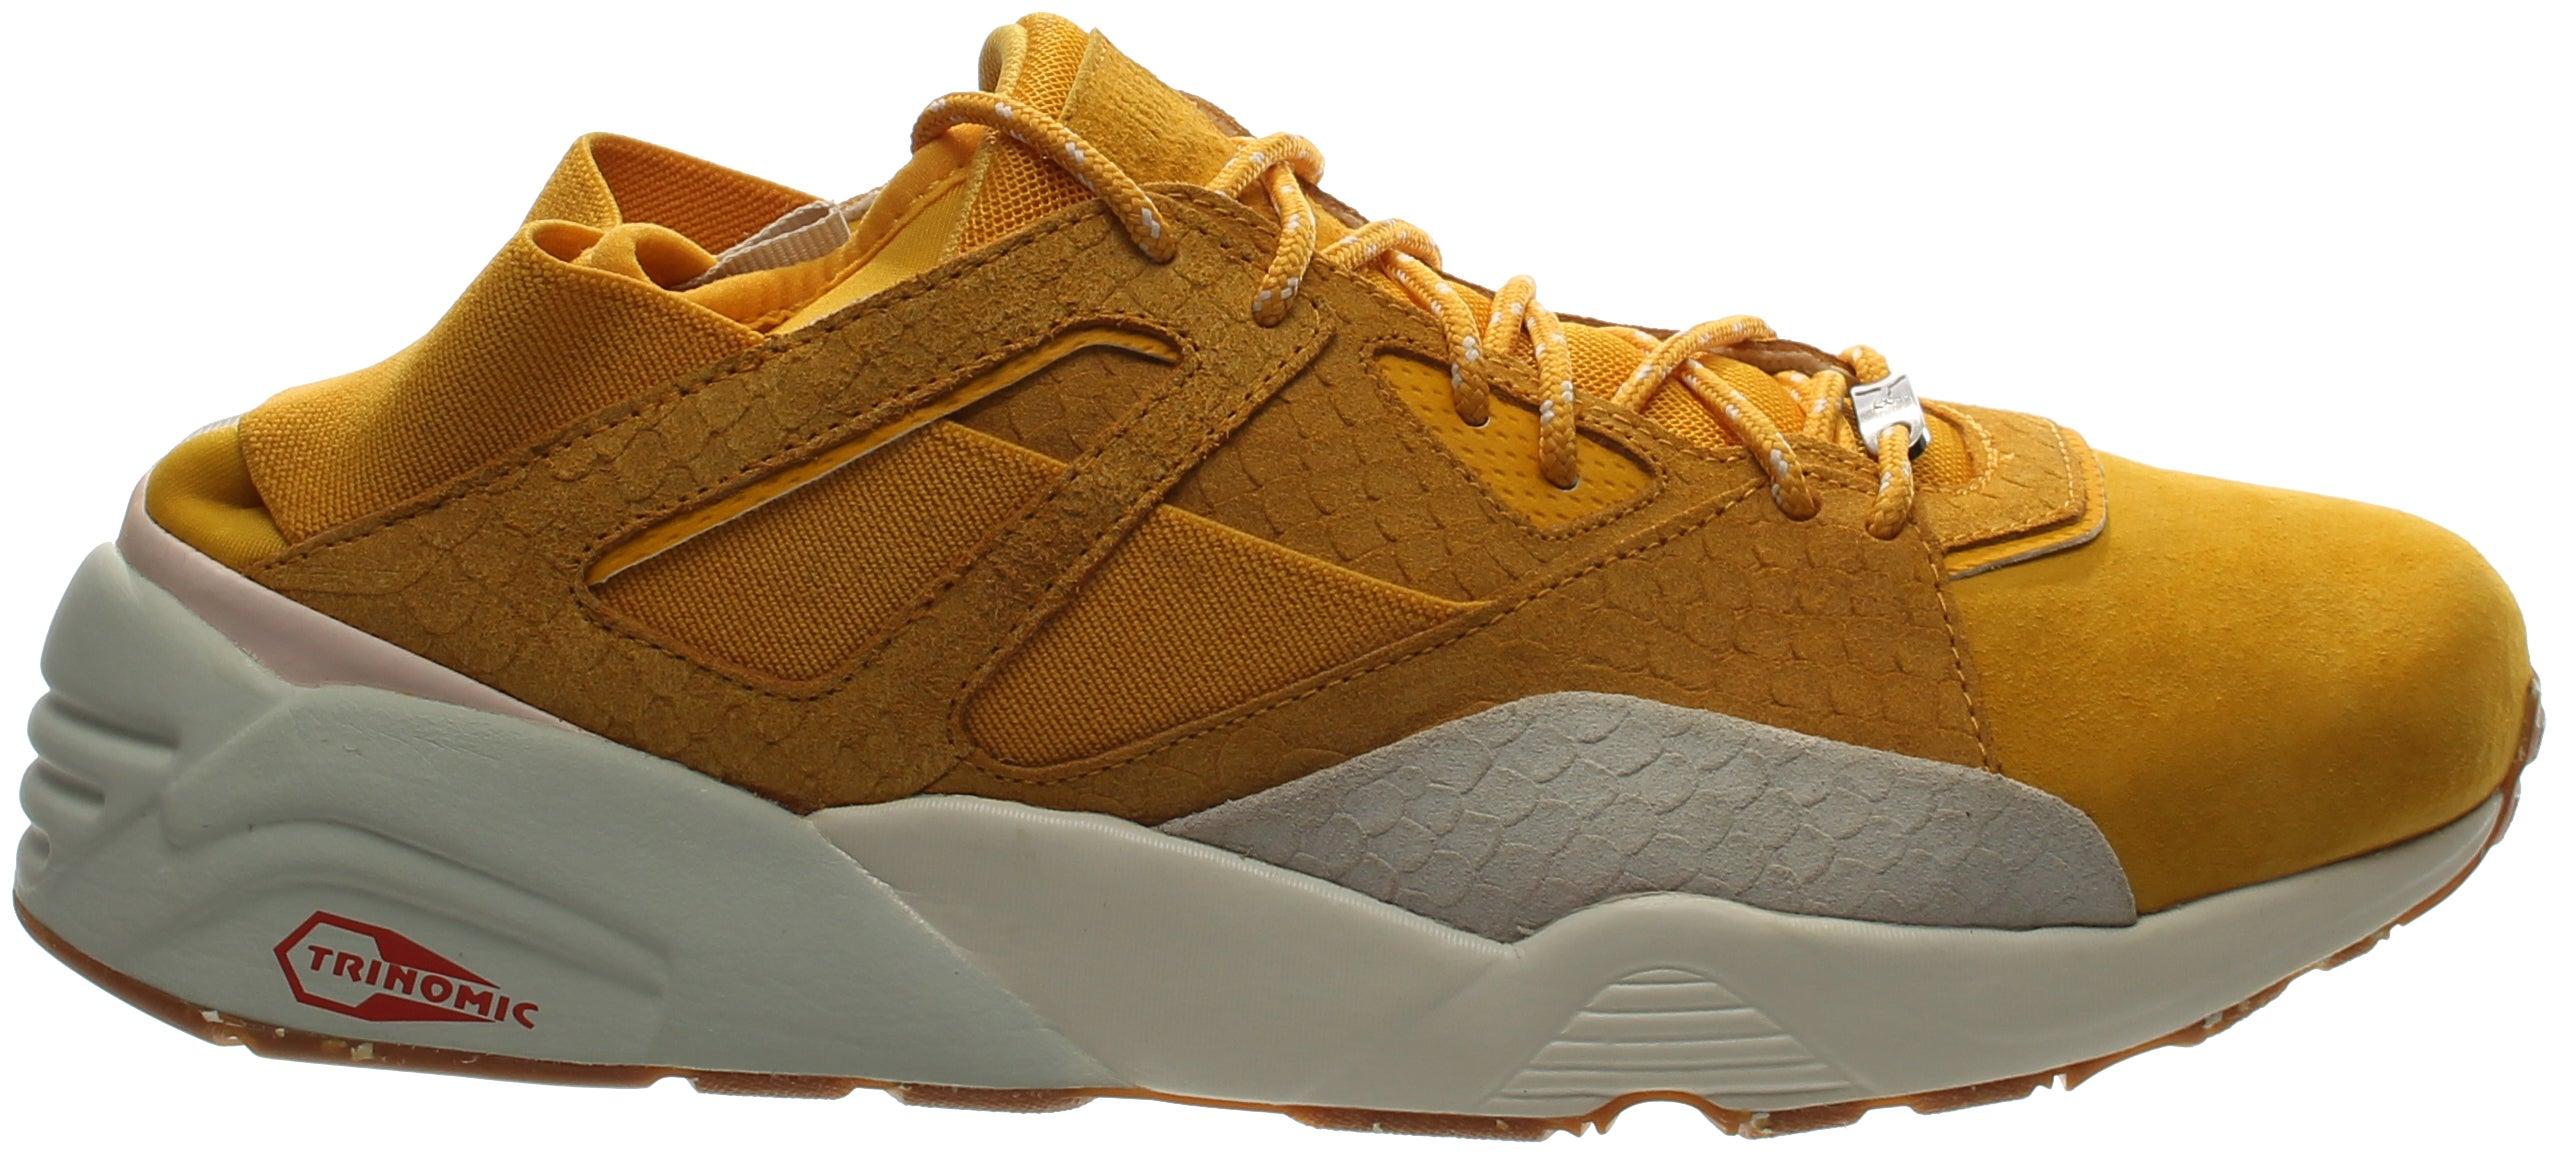 b51d3e81e1179 Puma Blaze Of Glory Sock Ice Cream Sneakers - Yellow - Mens | eBay